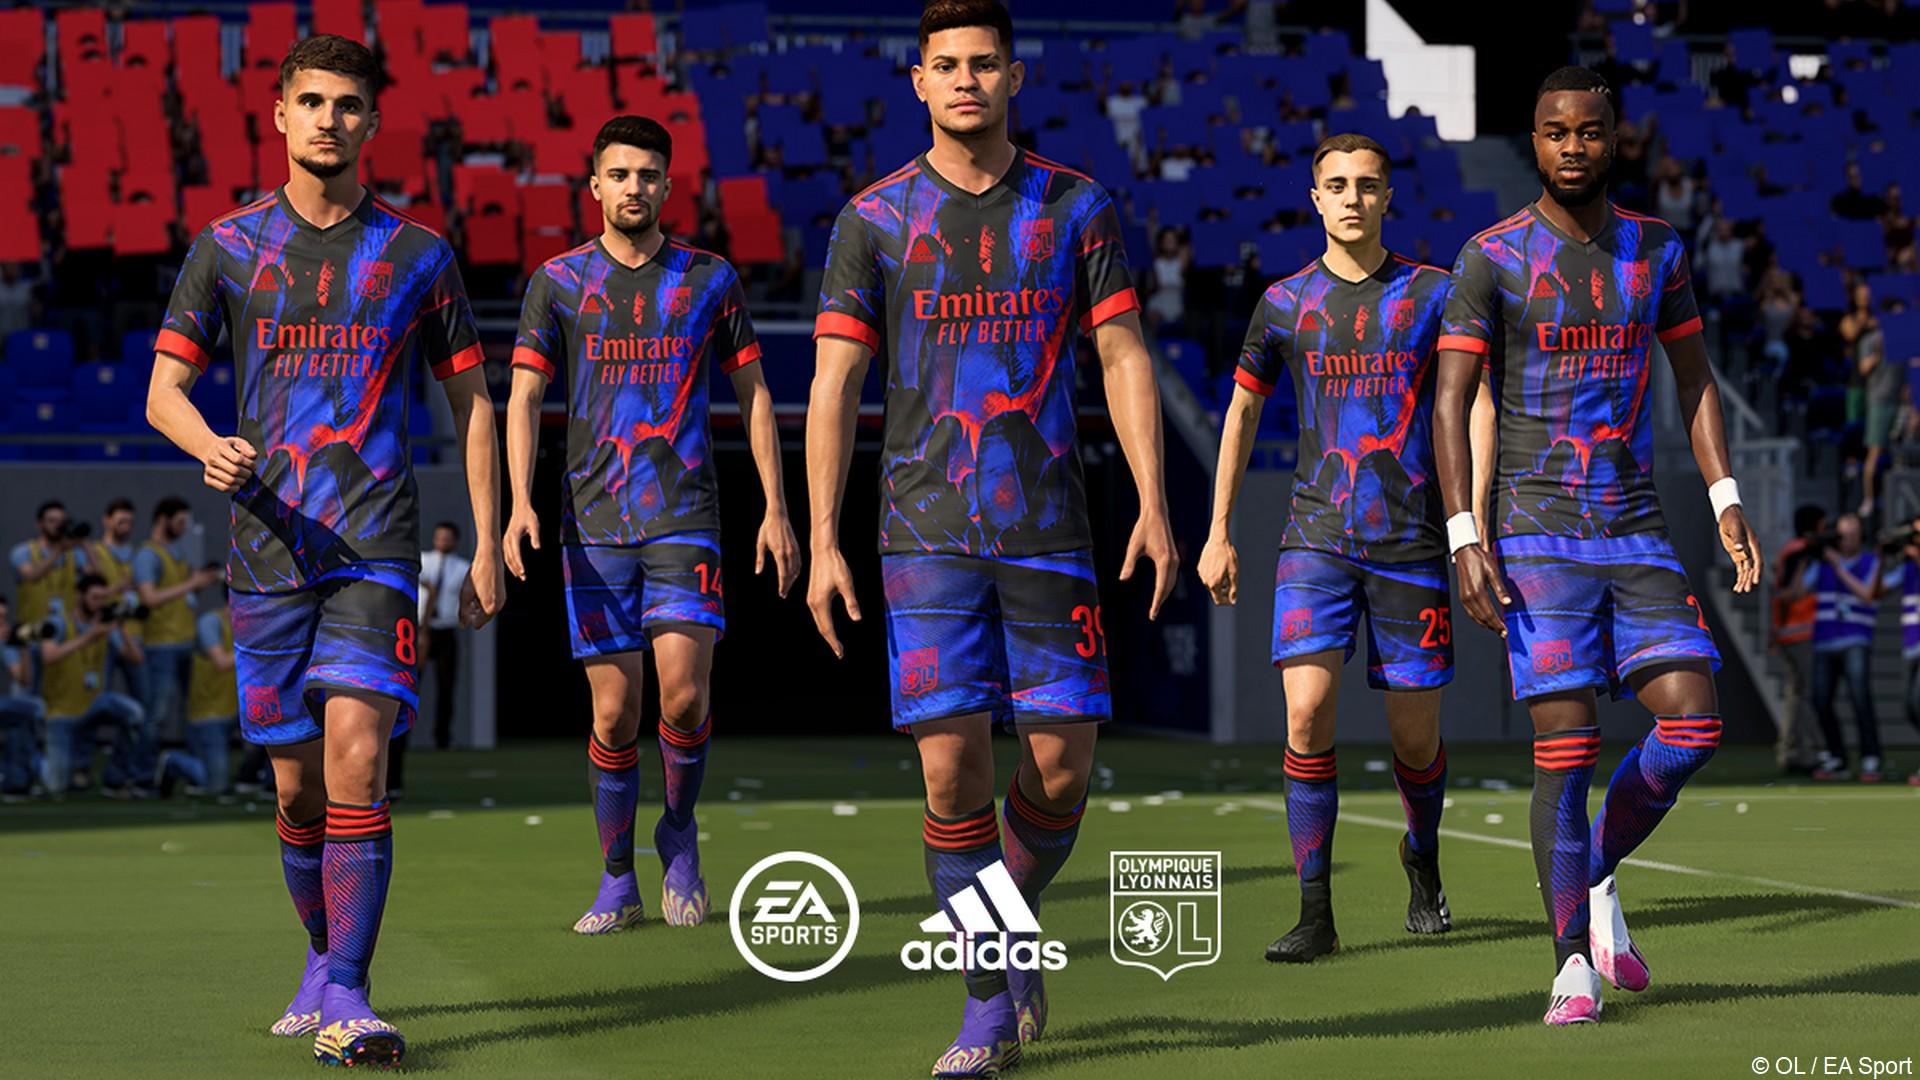 Adidas OL x EA Sport FIFA (football) maillot 2021